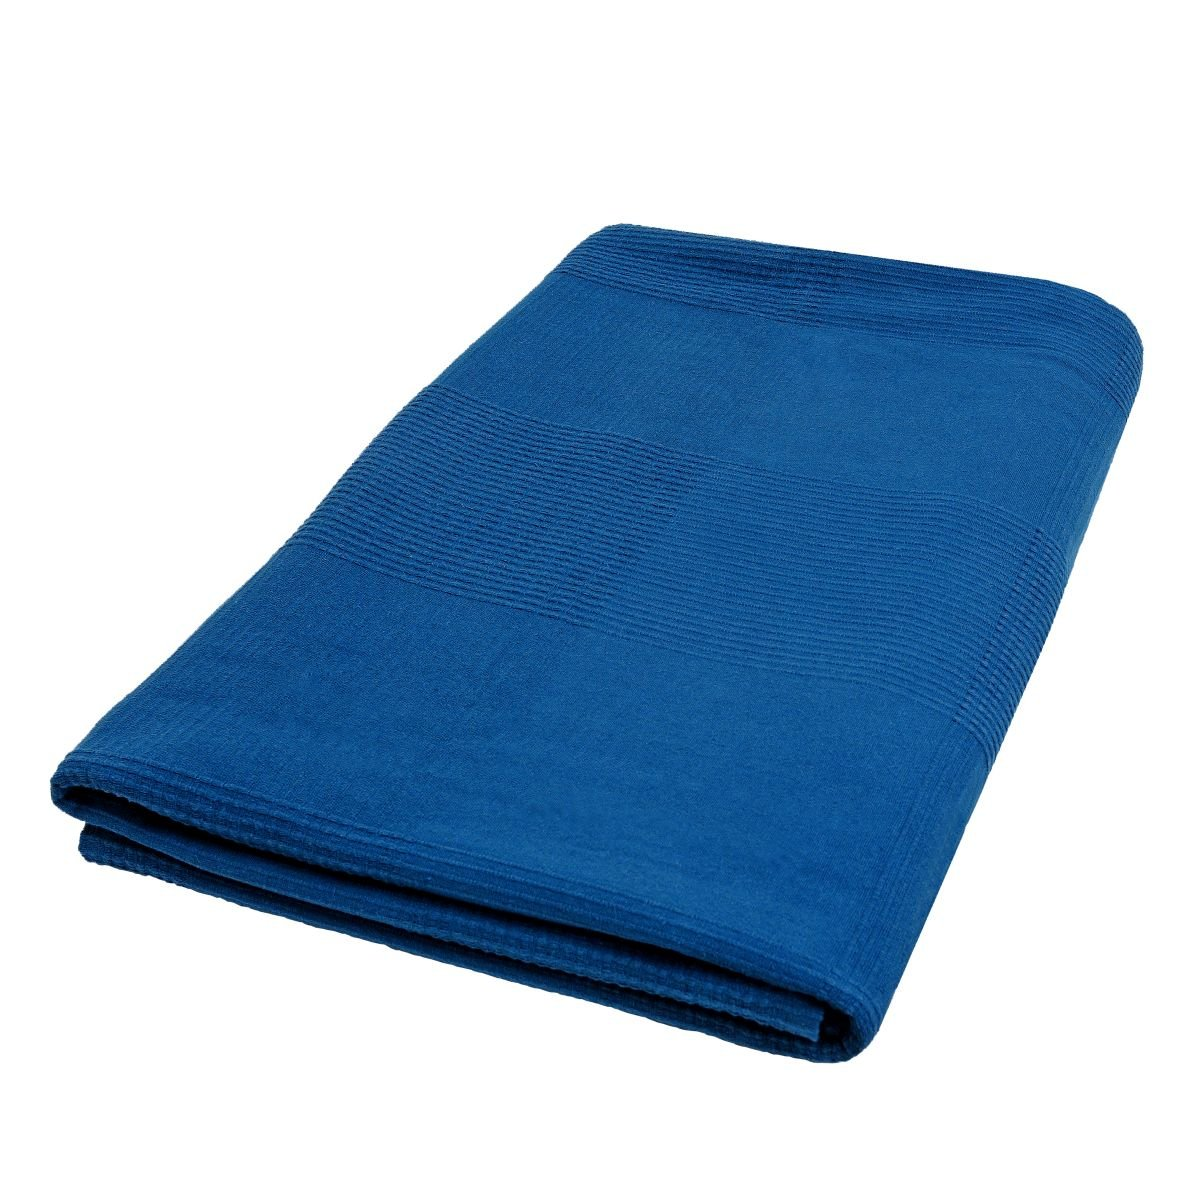 Tagesdecke Waffel Decke Sofaüberwurf Bettüberwurf aus 100% Baumwolle ...